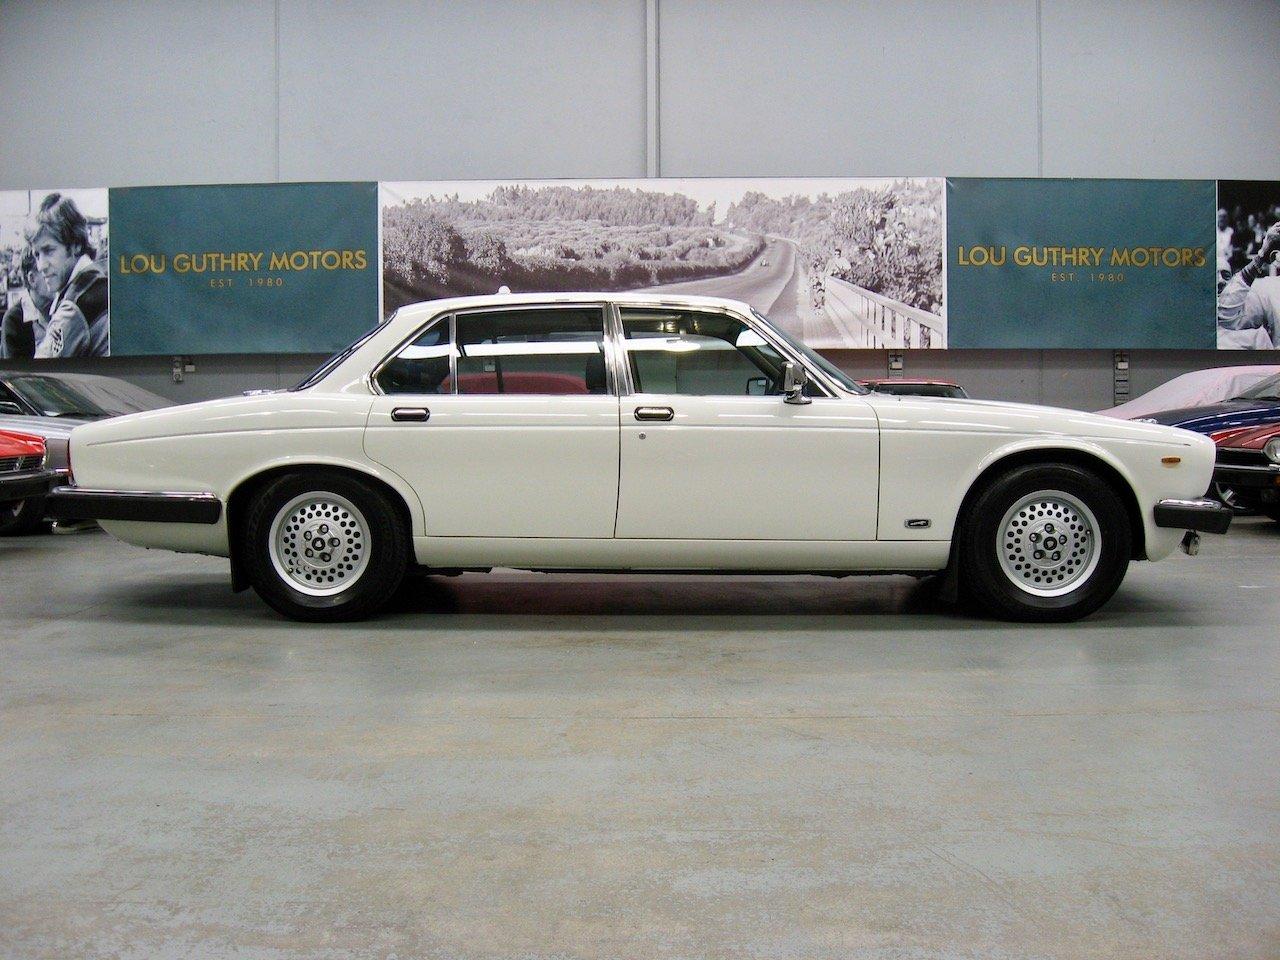 1988 Jaguar XJ12 Series 3 V12 Sovereign For Sale (picture 1 of 6)